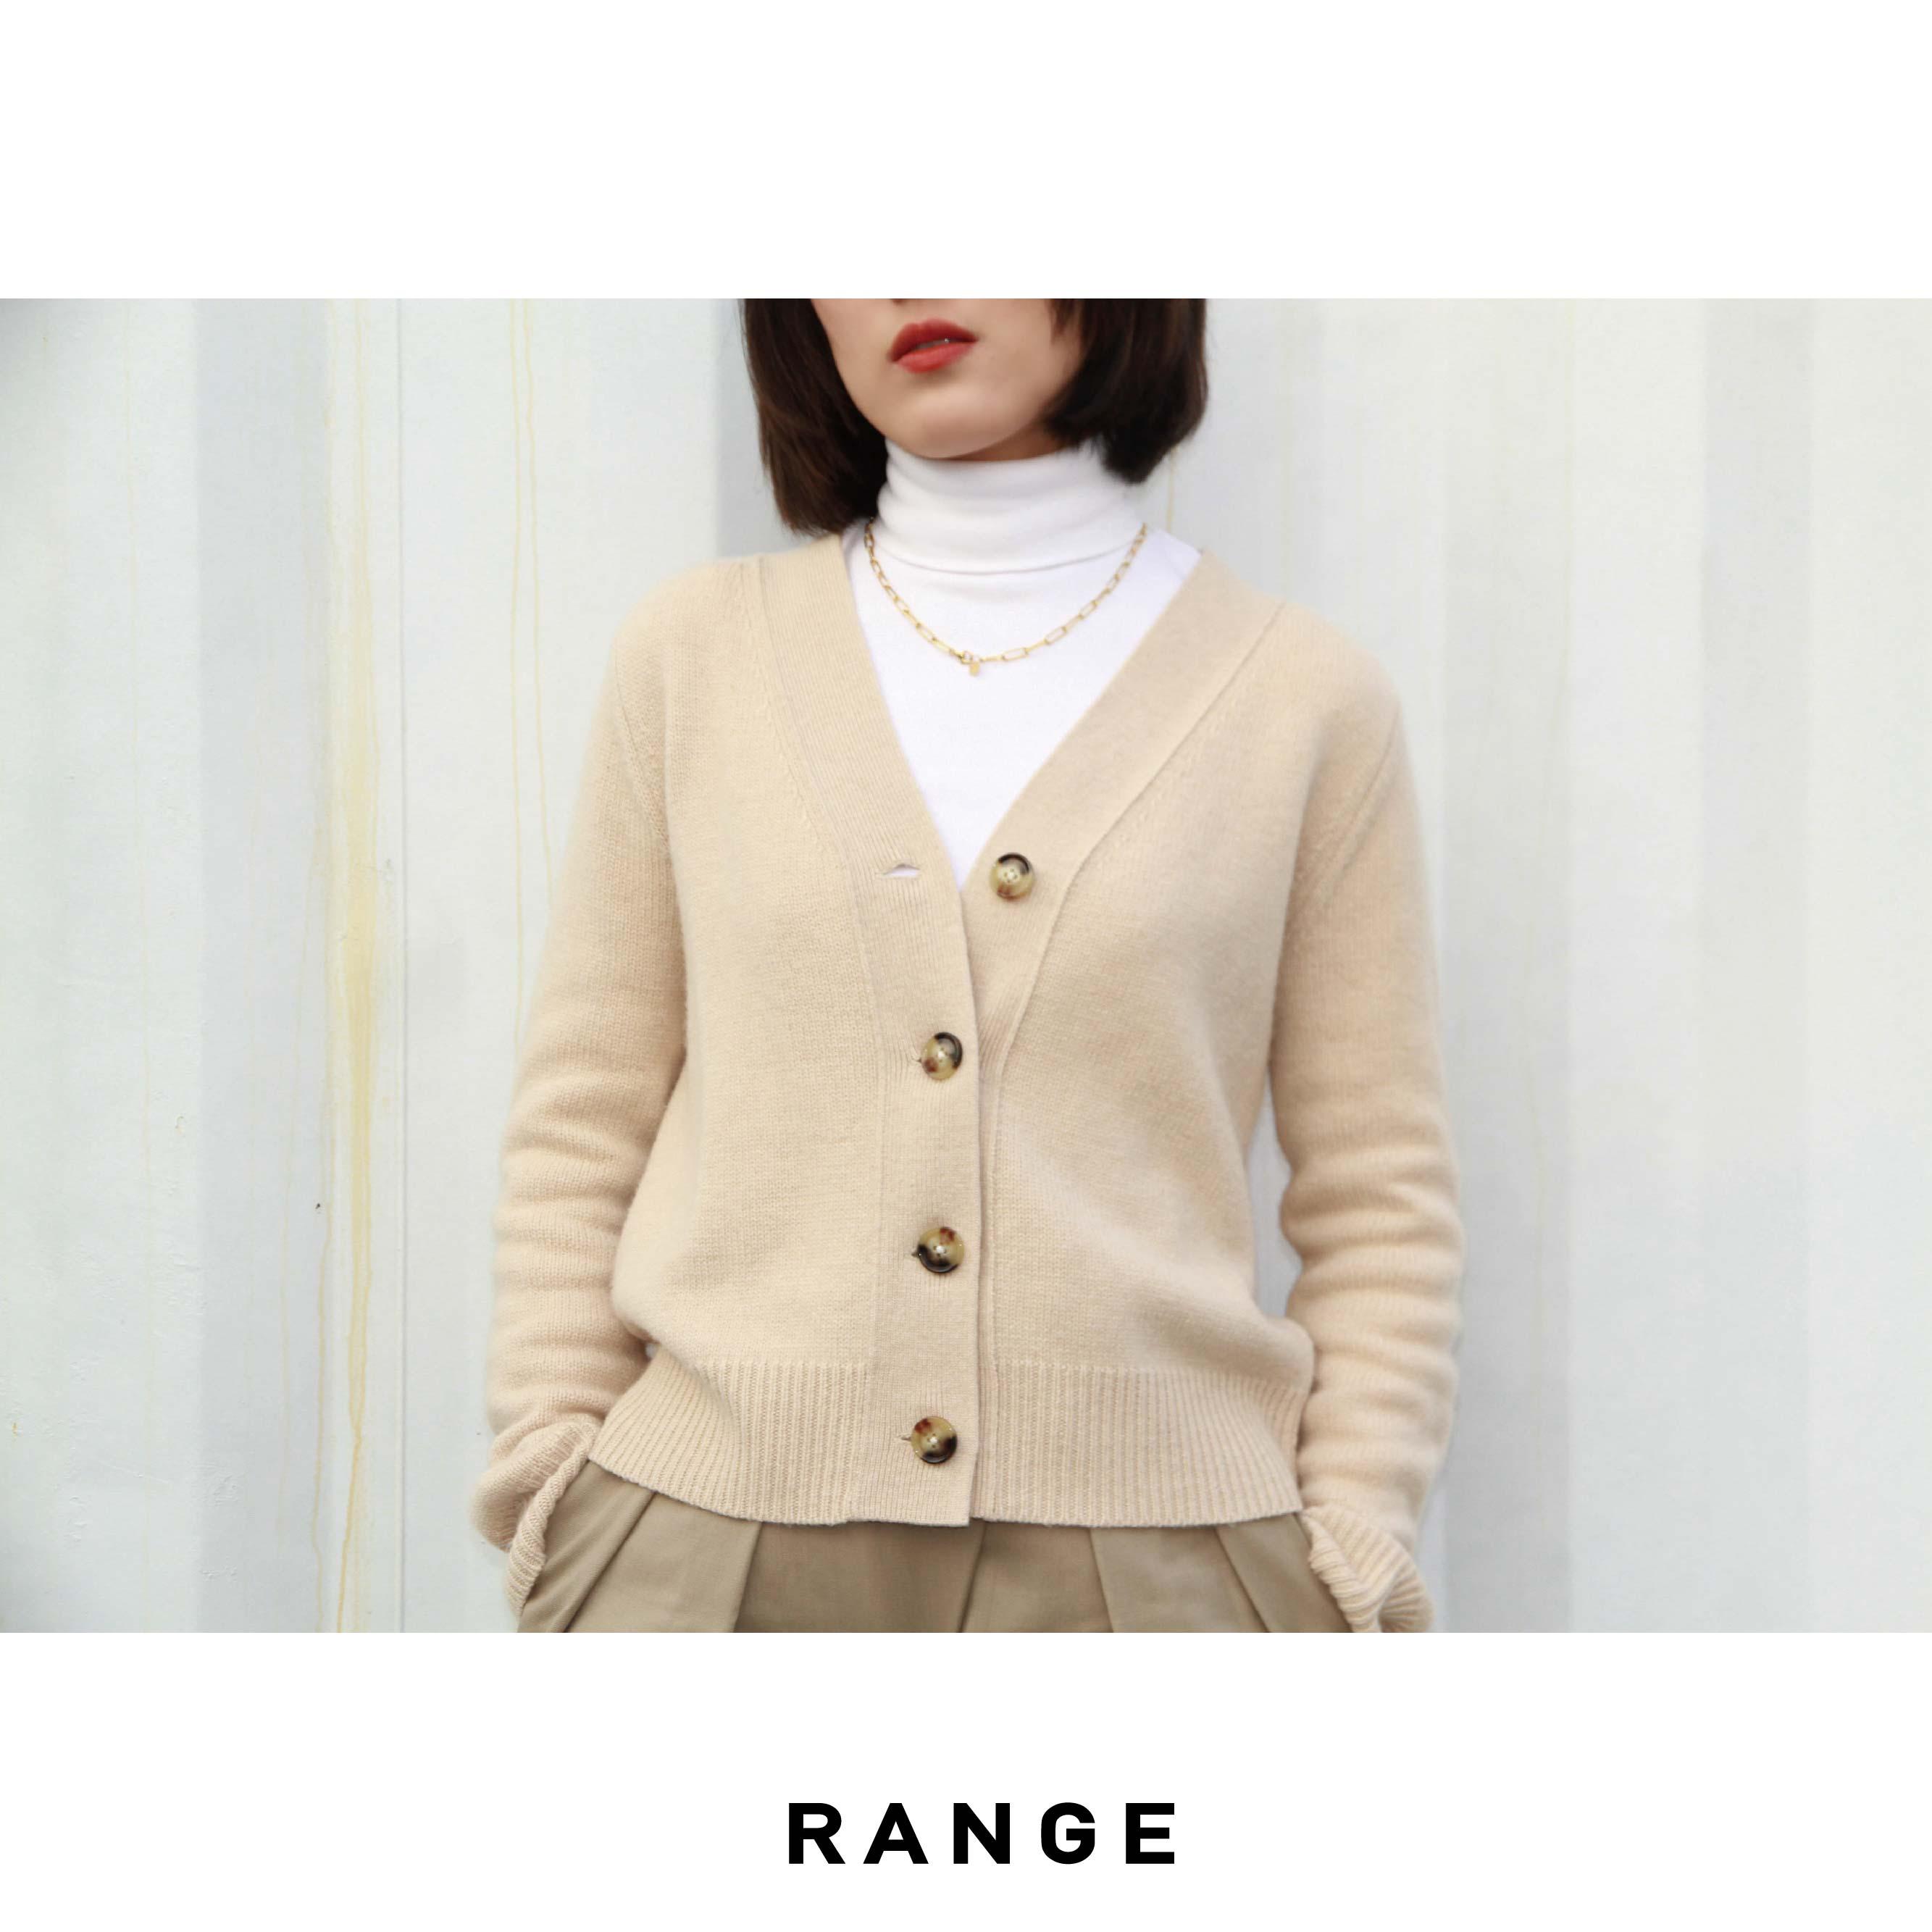 Range cashmere spring cardigan female V-neck designer long sleeve advanced minimalist temperament oatmeal white sweater